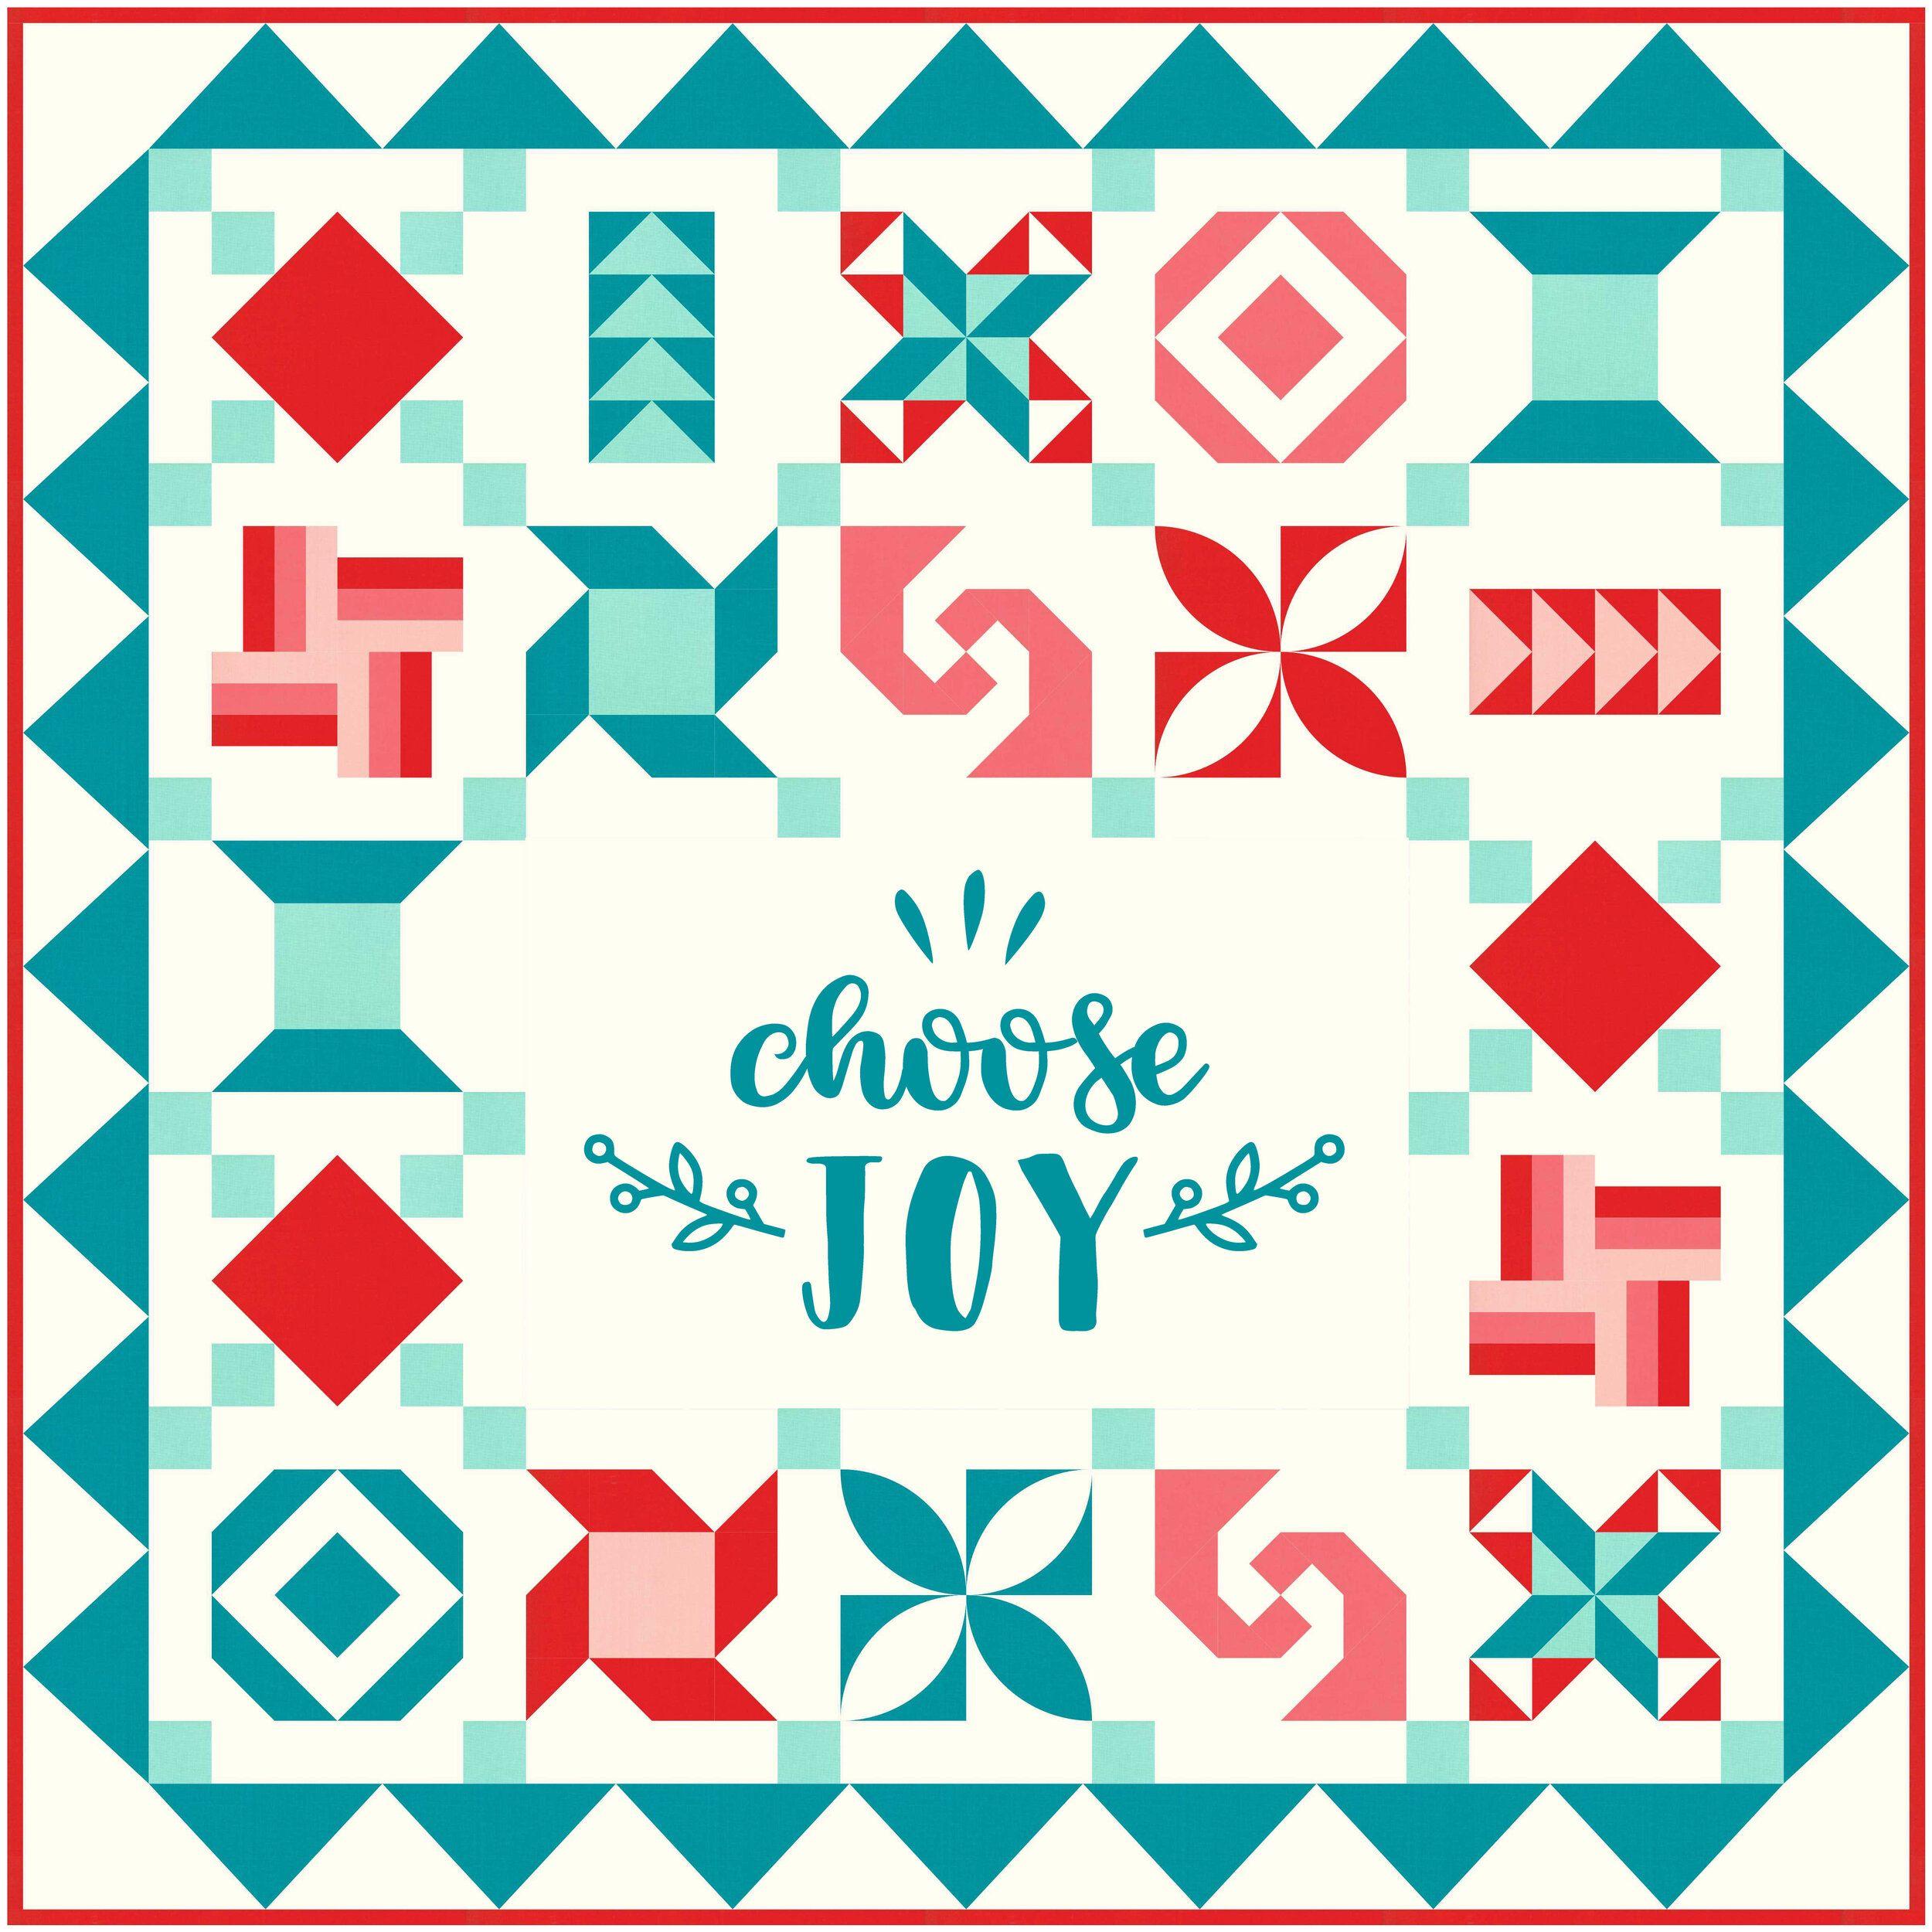 Join My Choose Joy BOM Quilt Club!